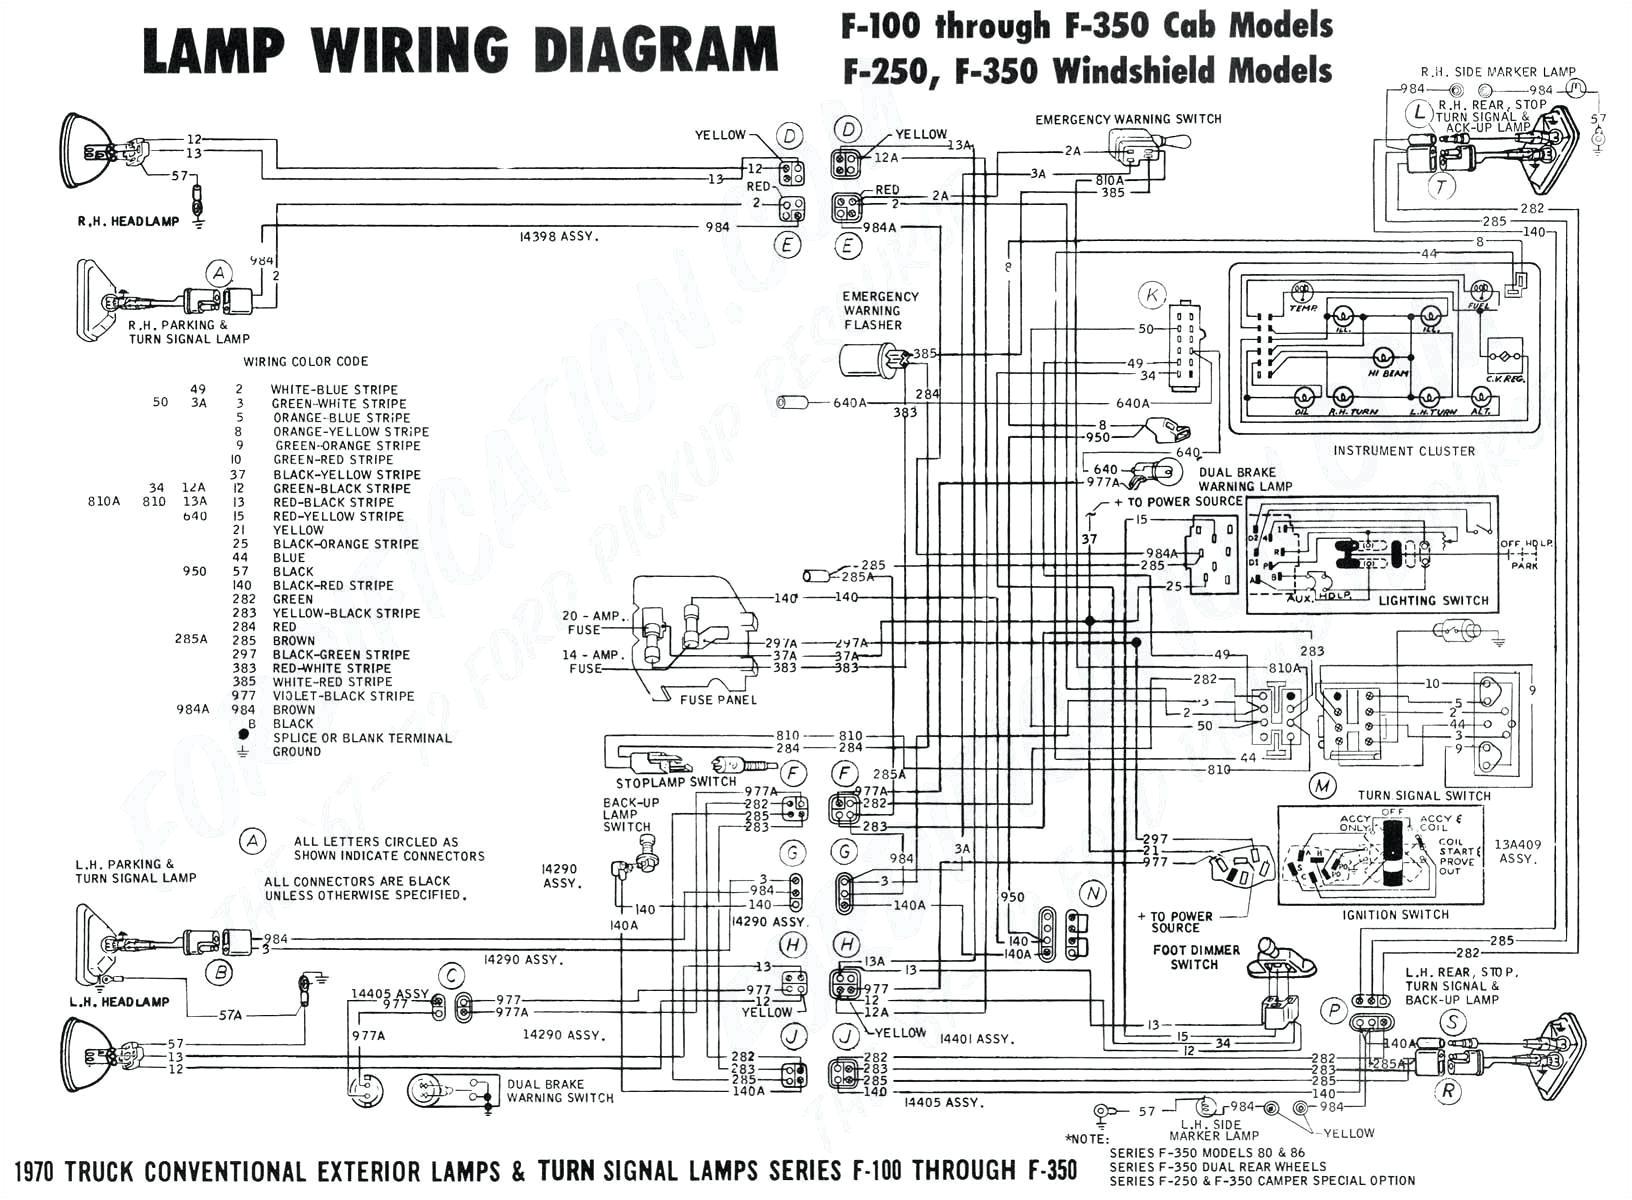 bmw f800st wiring diagram wiring diagram insidebmw f800gt wiring diagram wiring diagrams konsult bmw f800st wiring